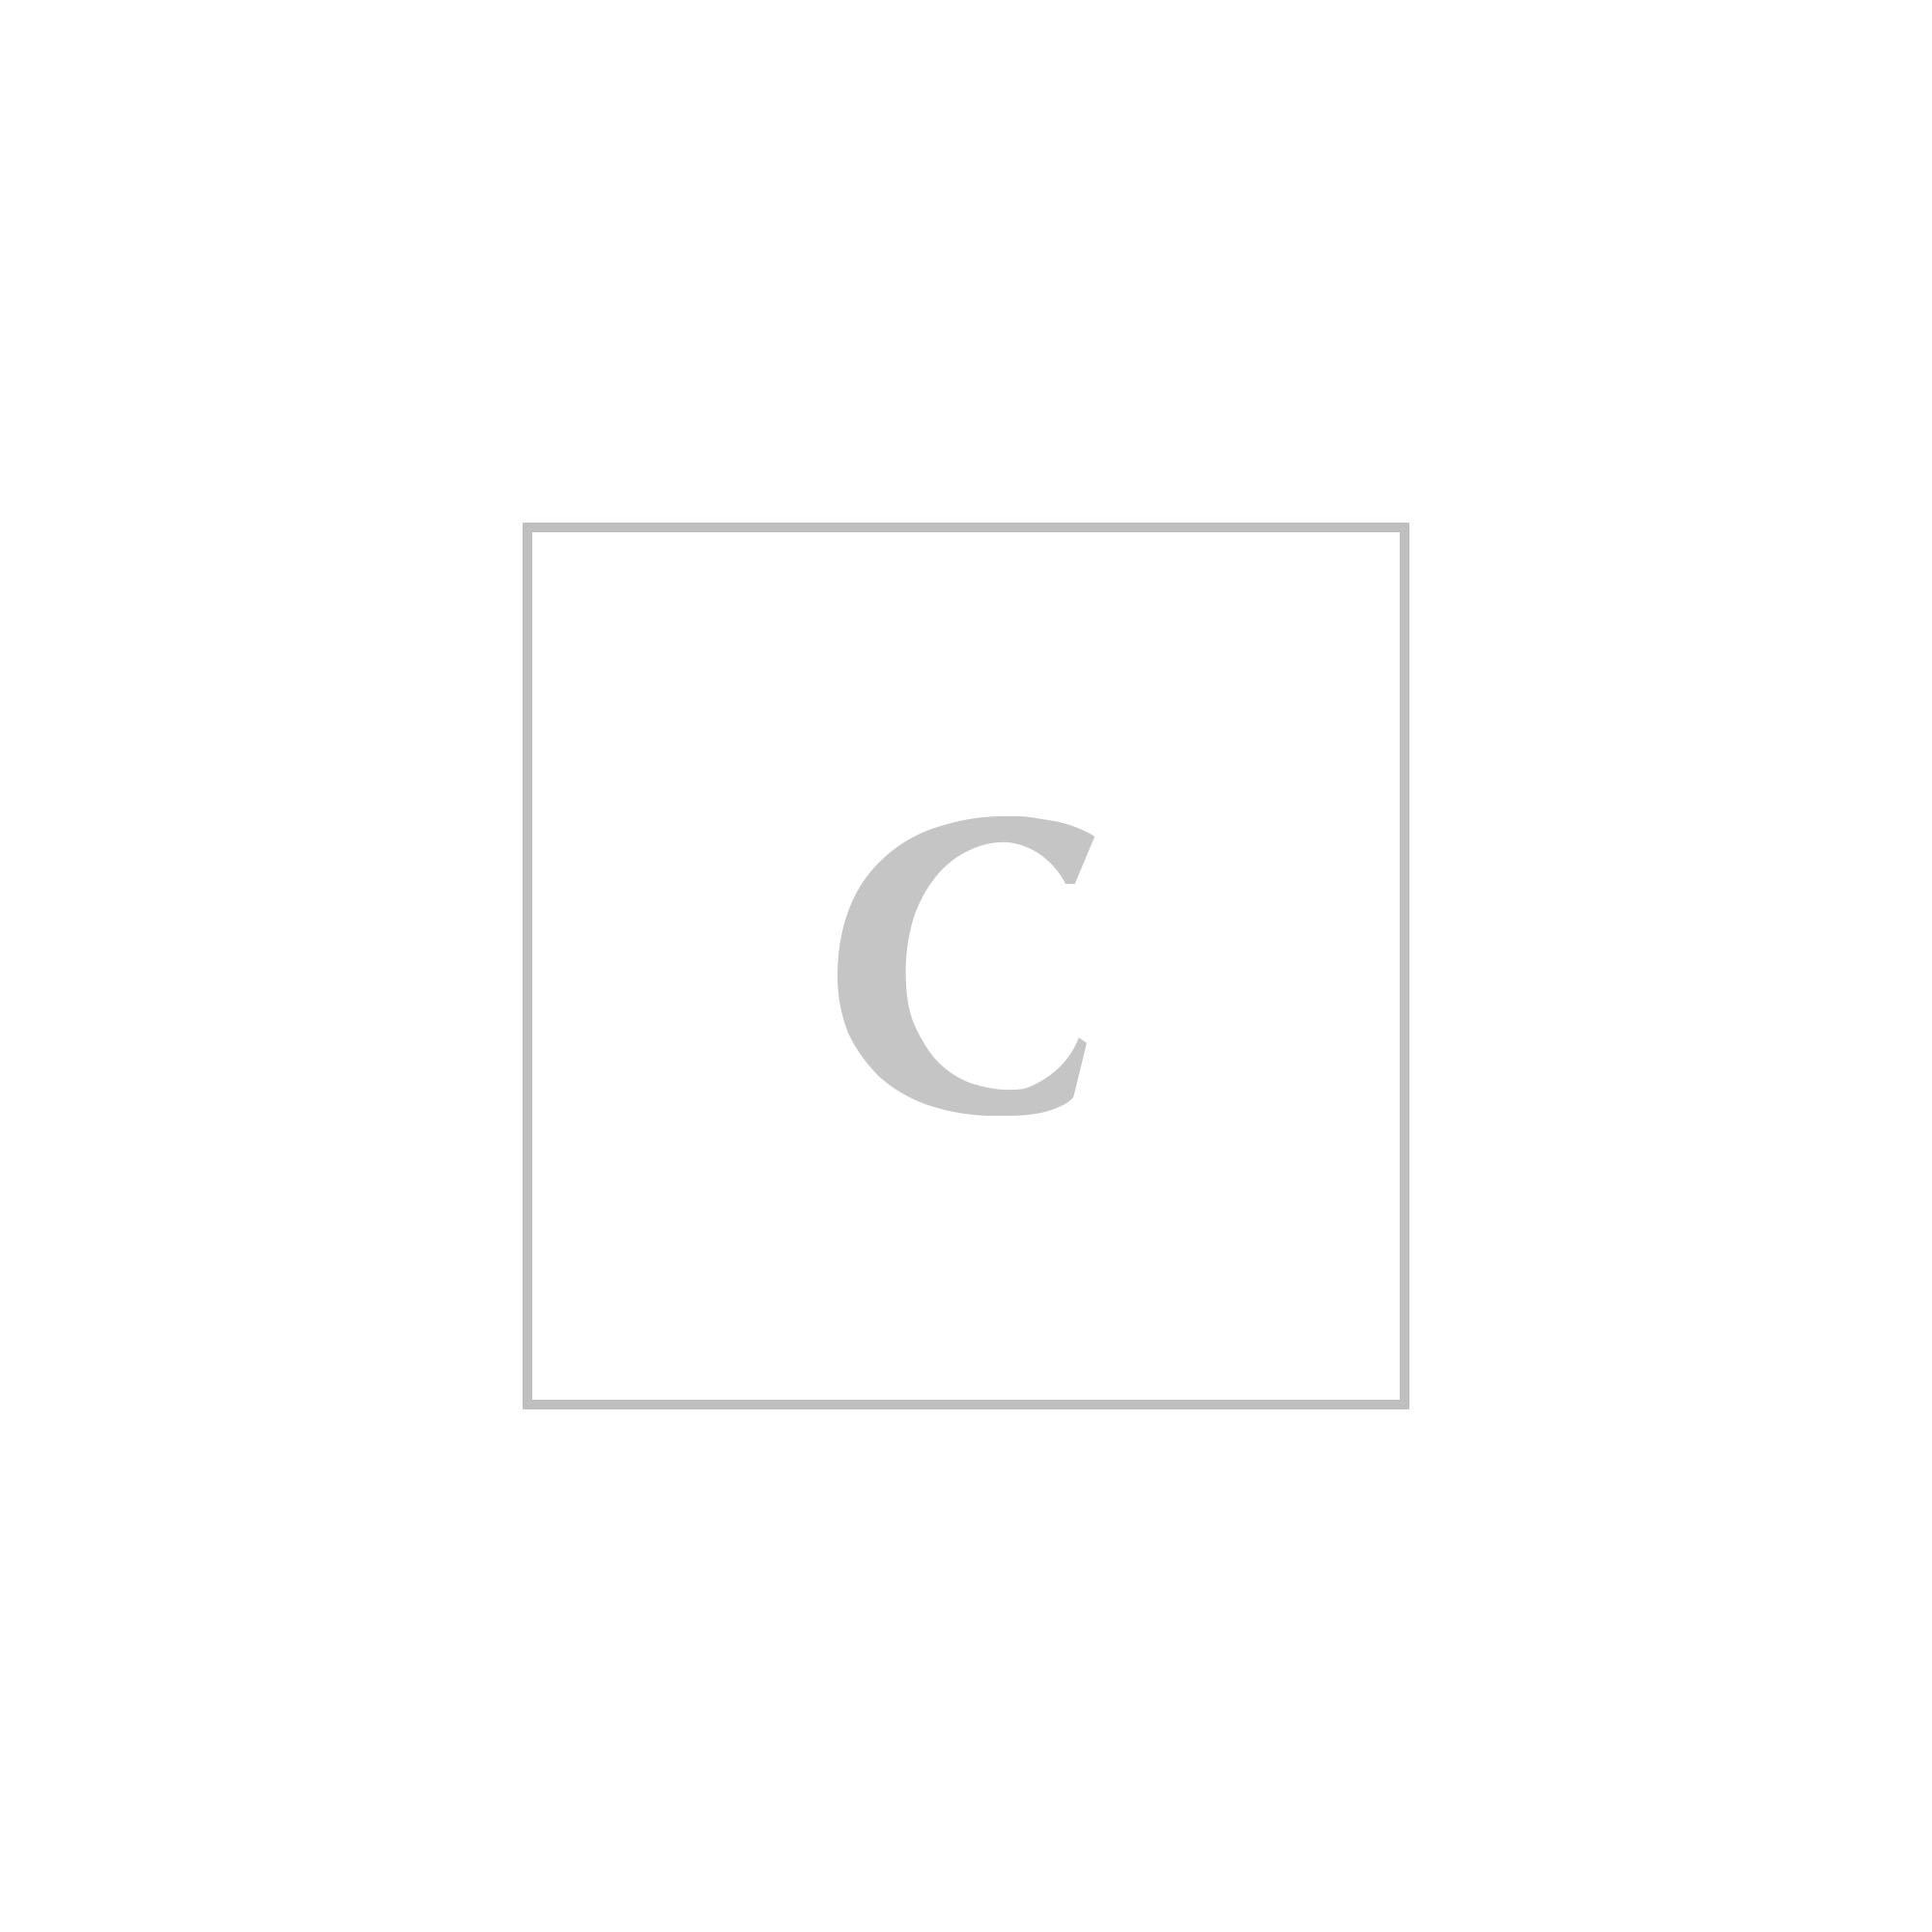 Saint laurent ysl borsa classic monogramme fringed small